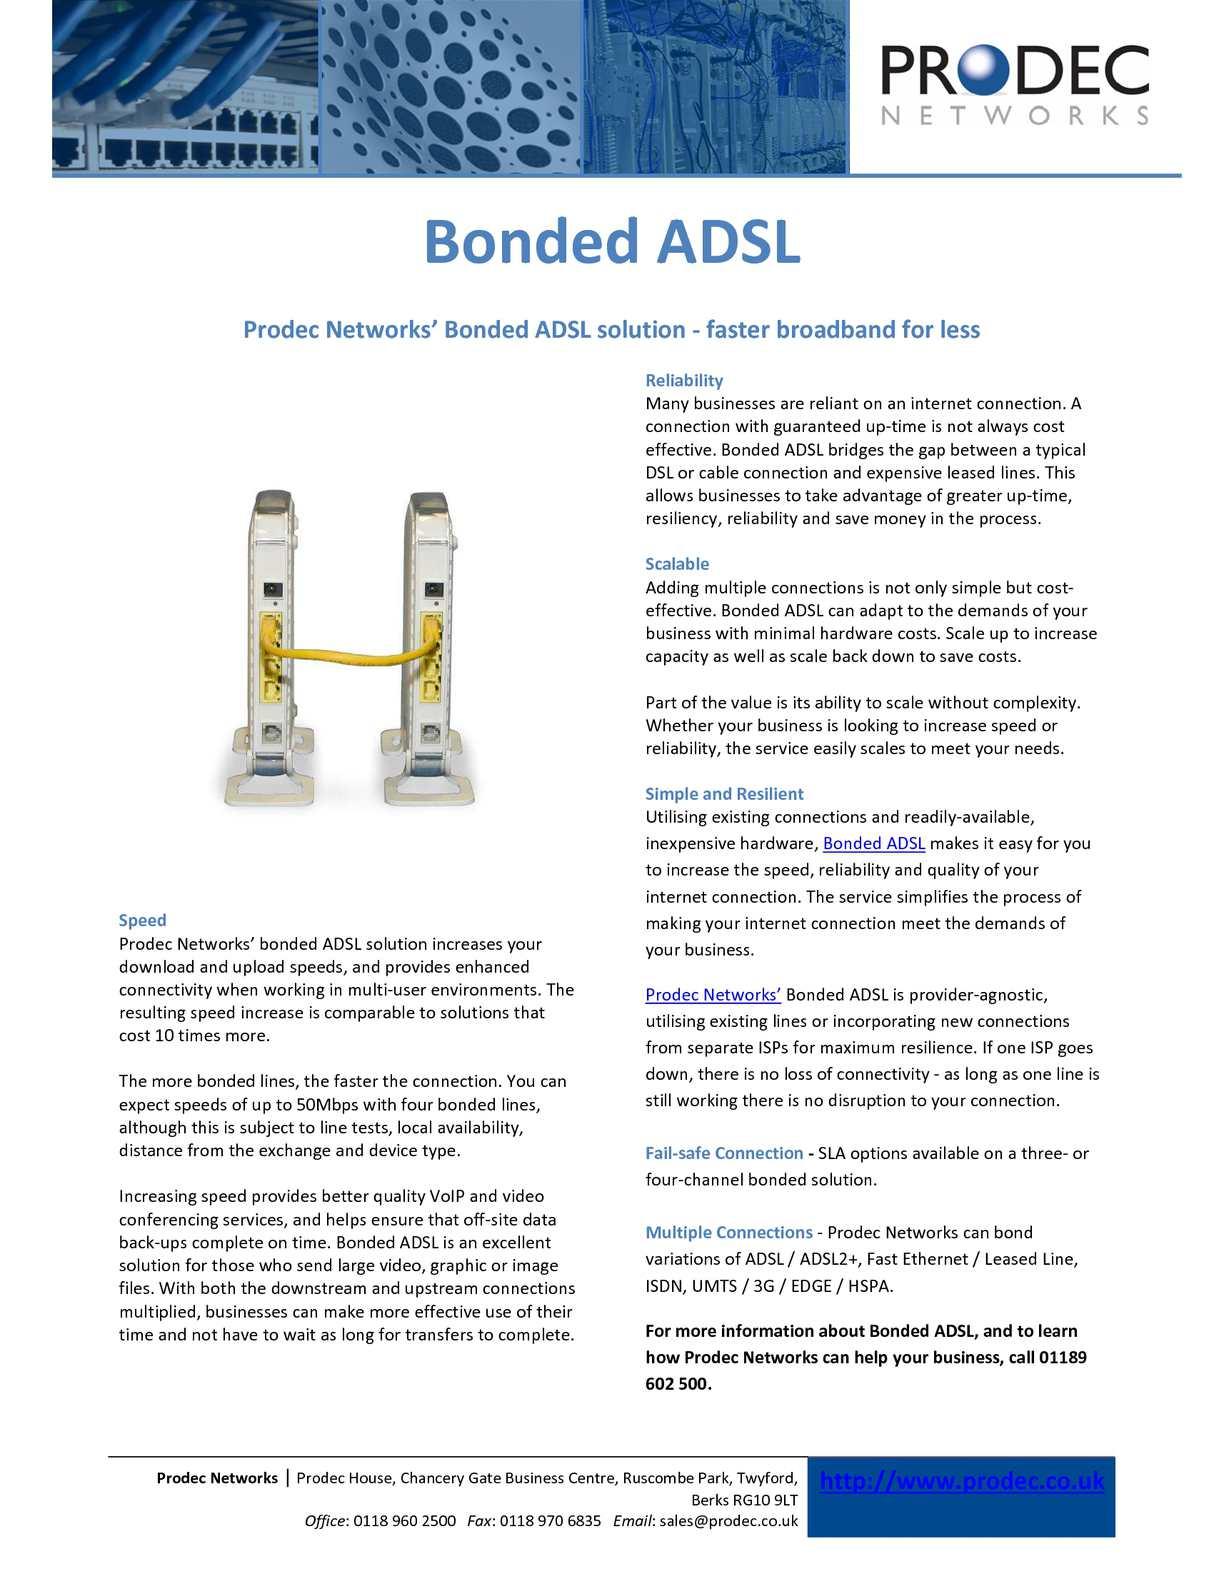 Calaméo - Prodec networks bonded adsl